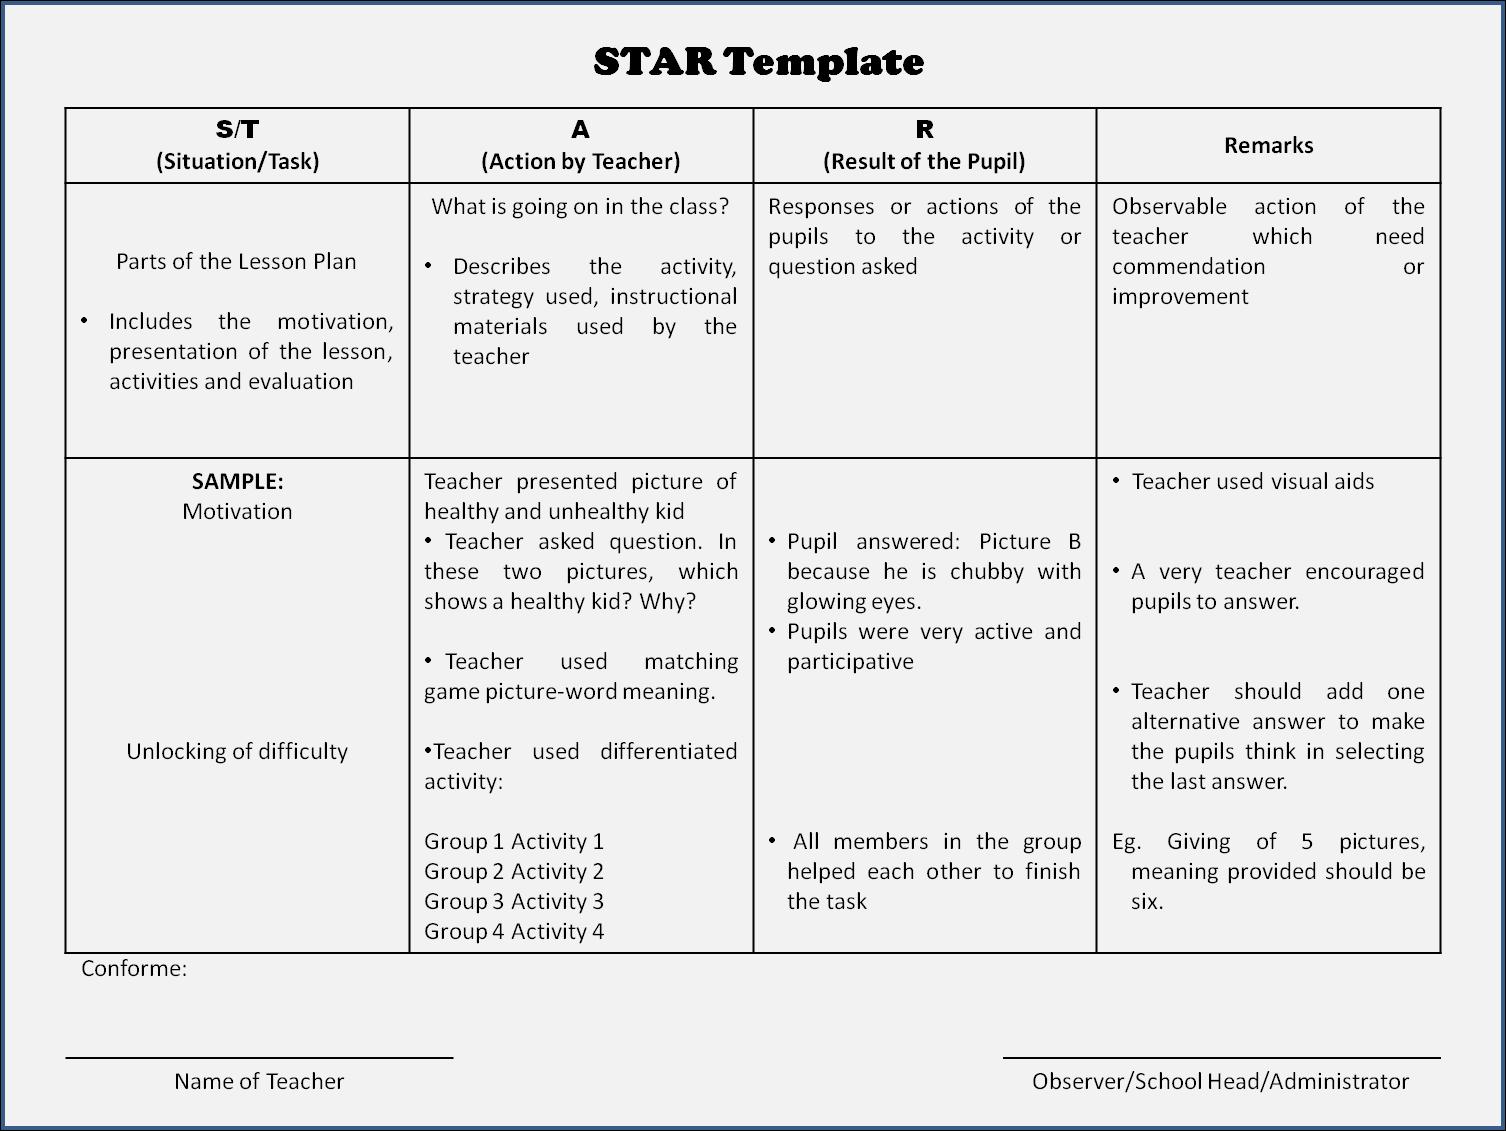 Lawanan Star Principal S Tool For Classroom Observation